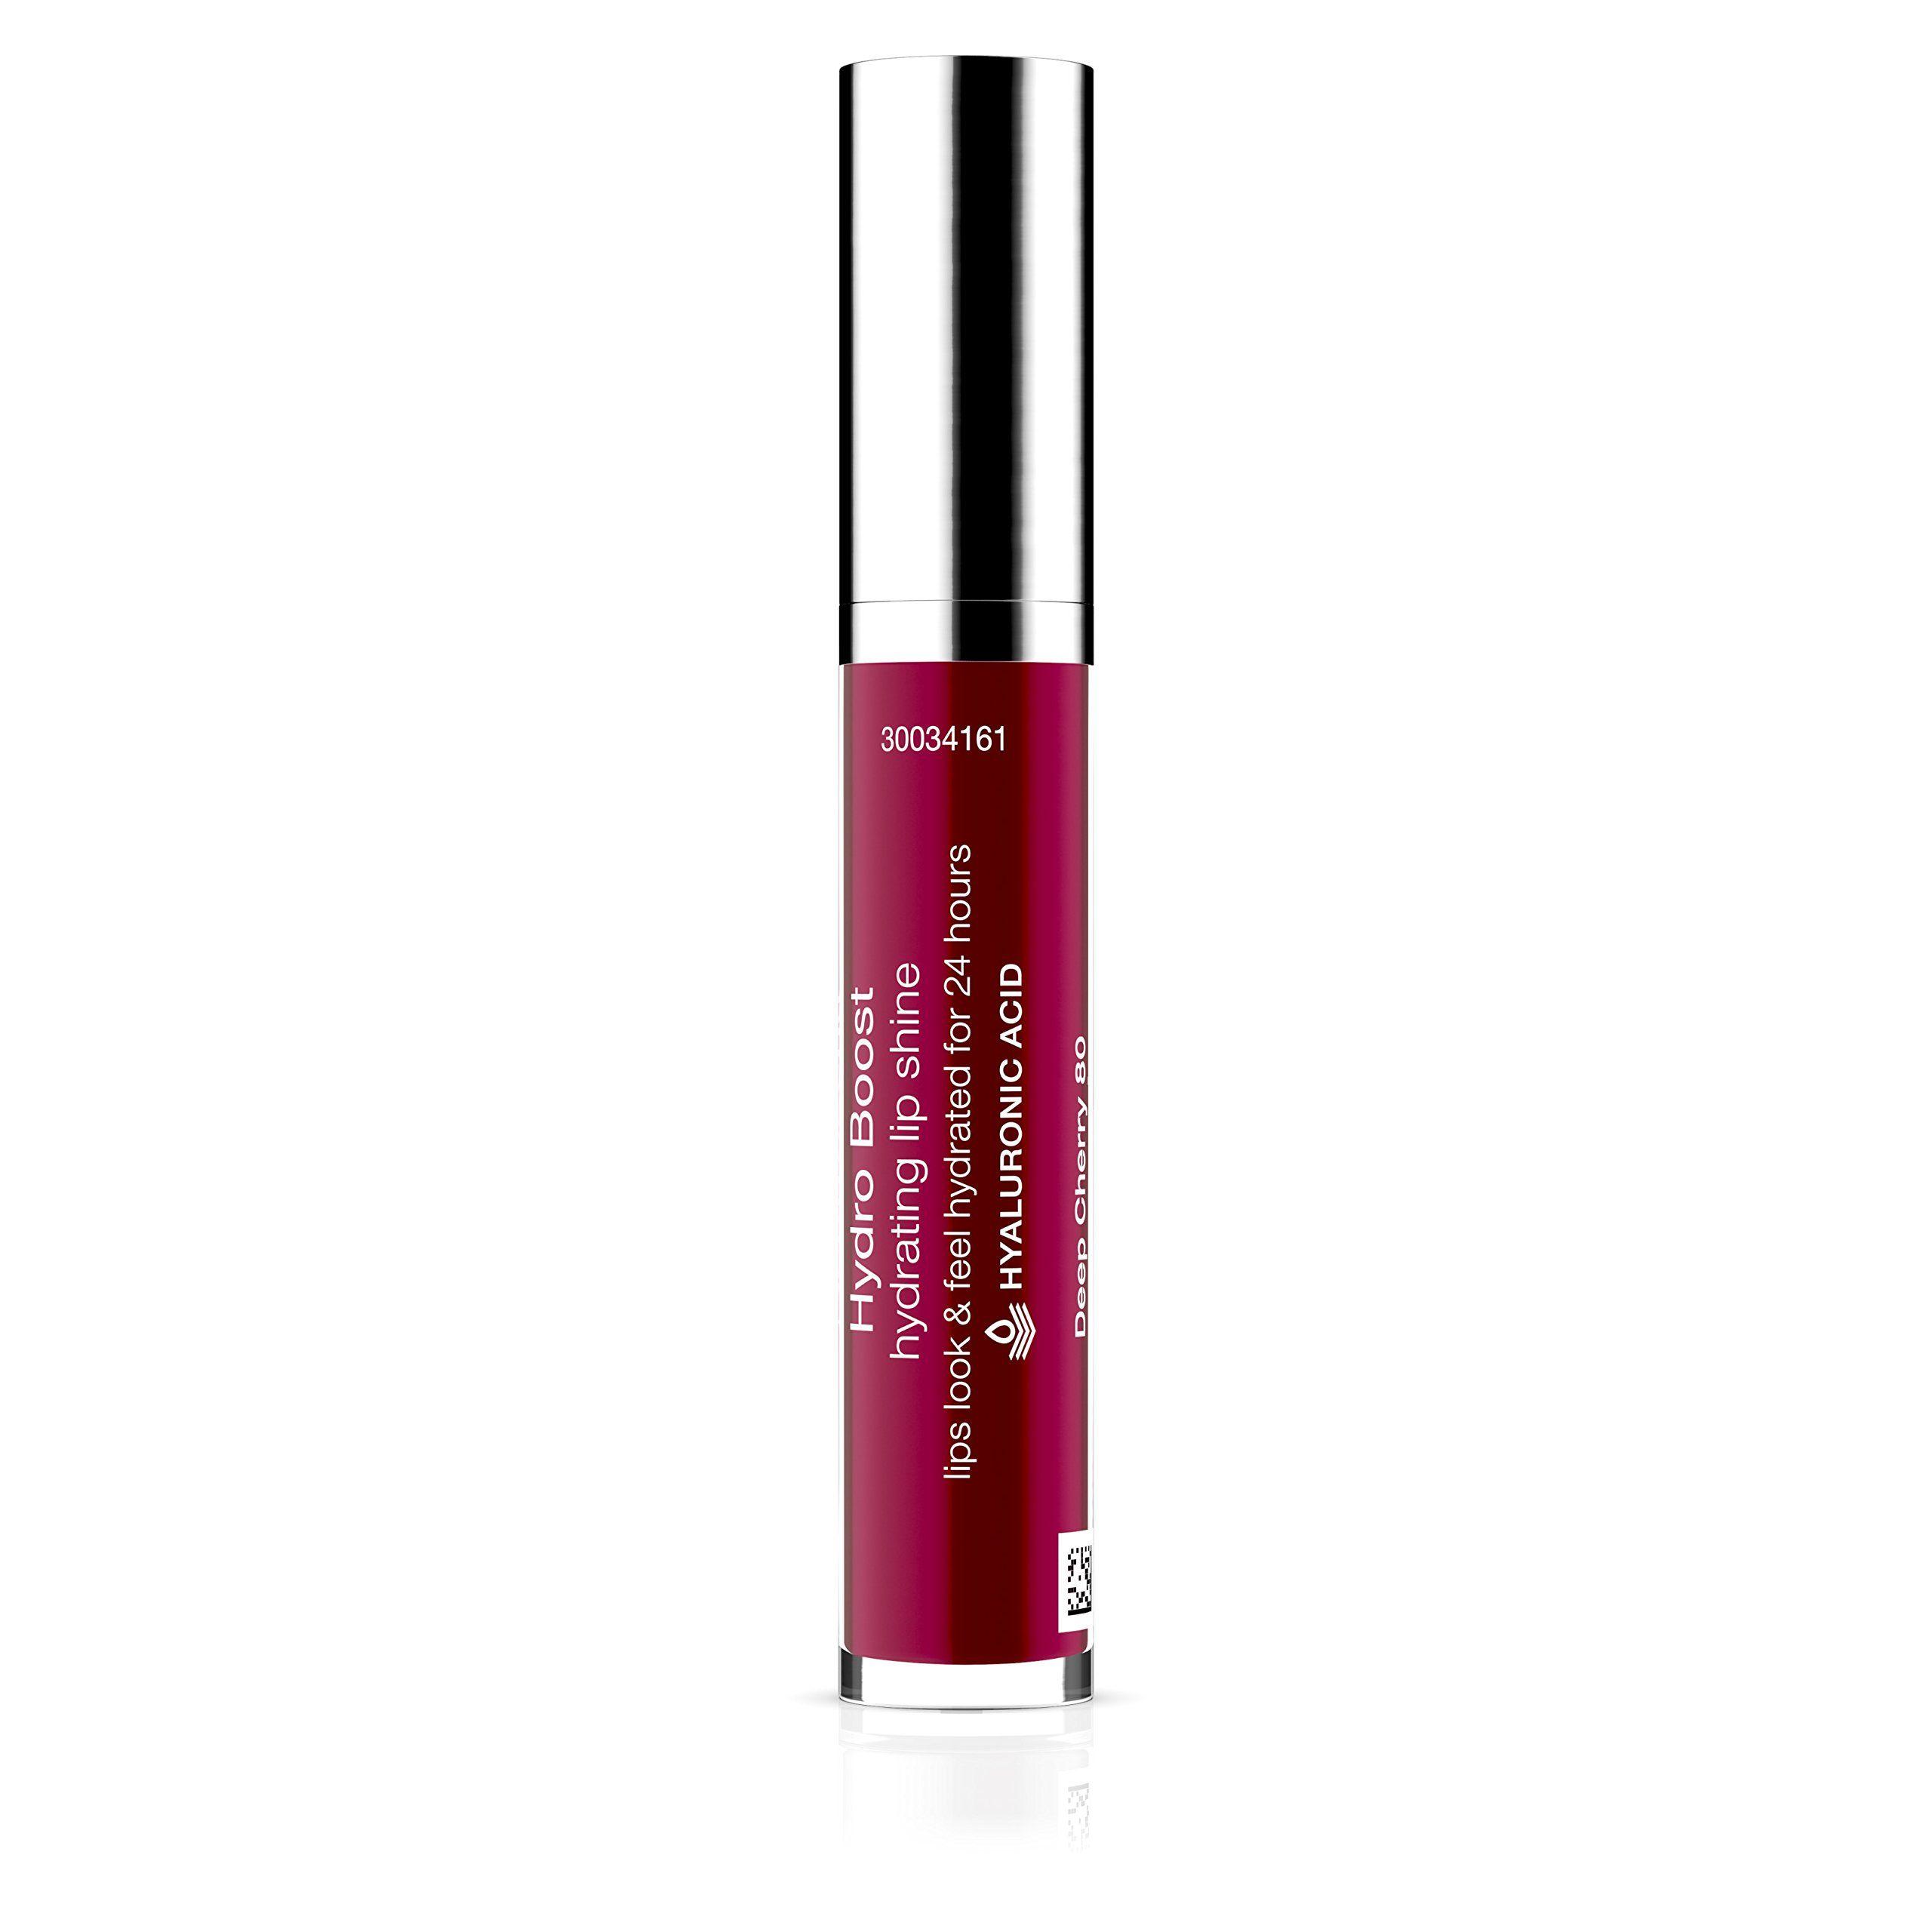 Neutrogena Hydro Boost Hydrating Lip Shine 80 Deep Cherry